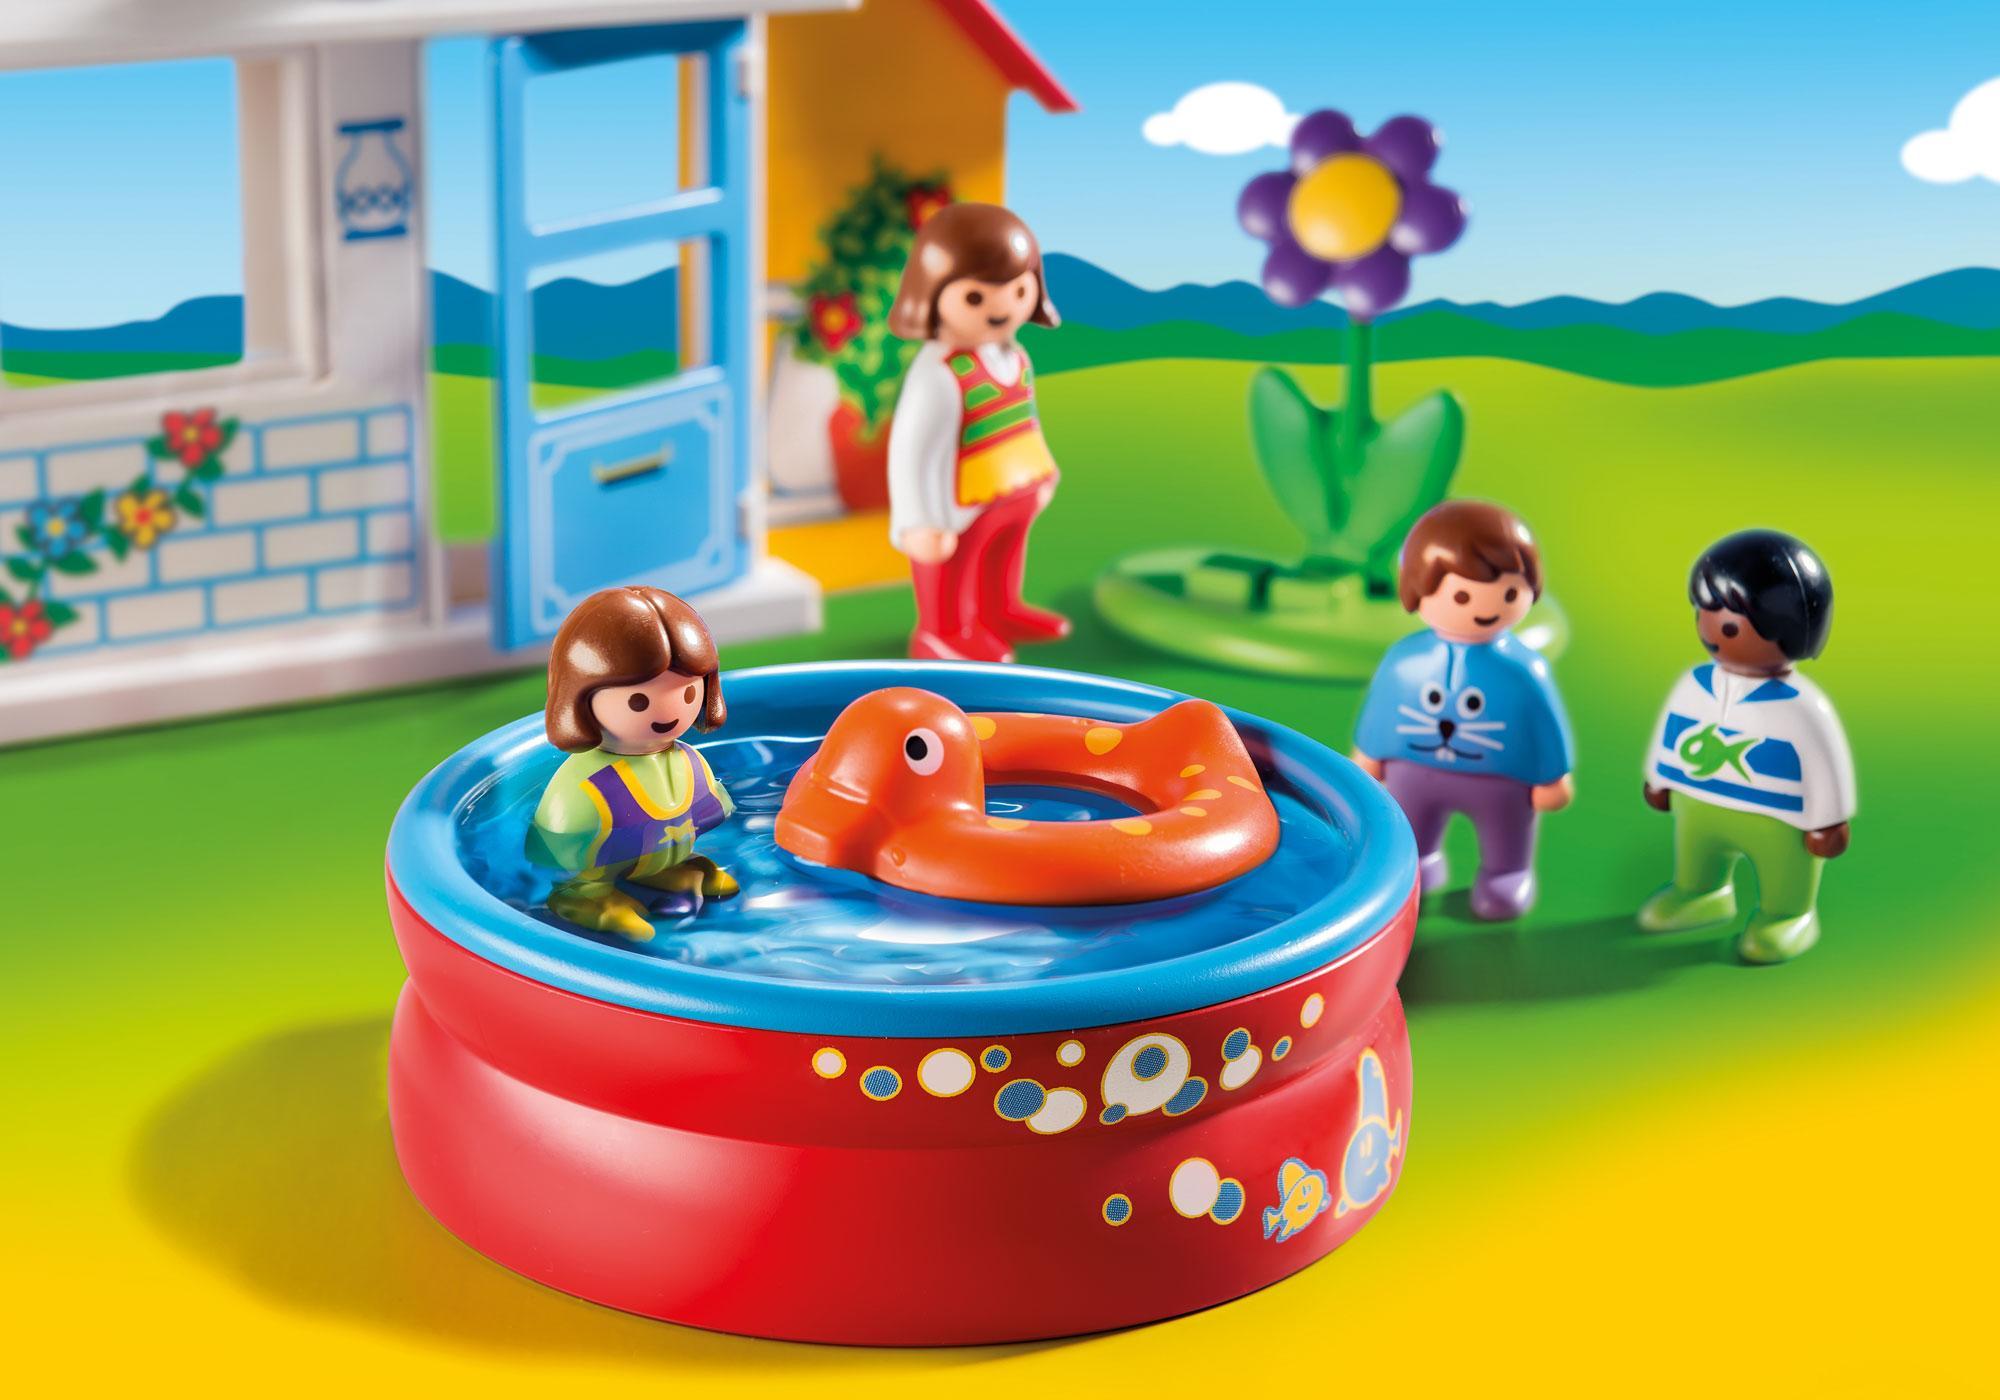 http://media.playmobil.com/i/playmobil/9527_product_extra3/1.2.3 Holiday Cottage